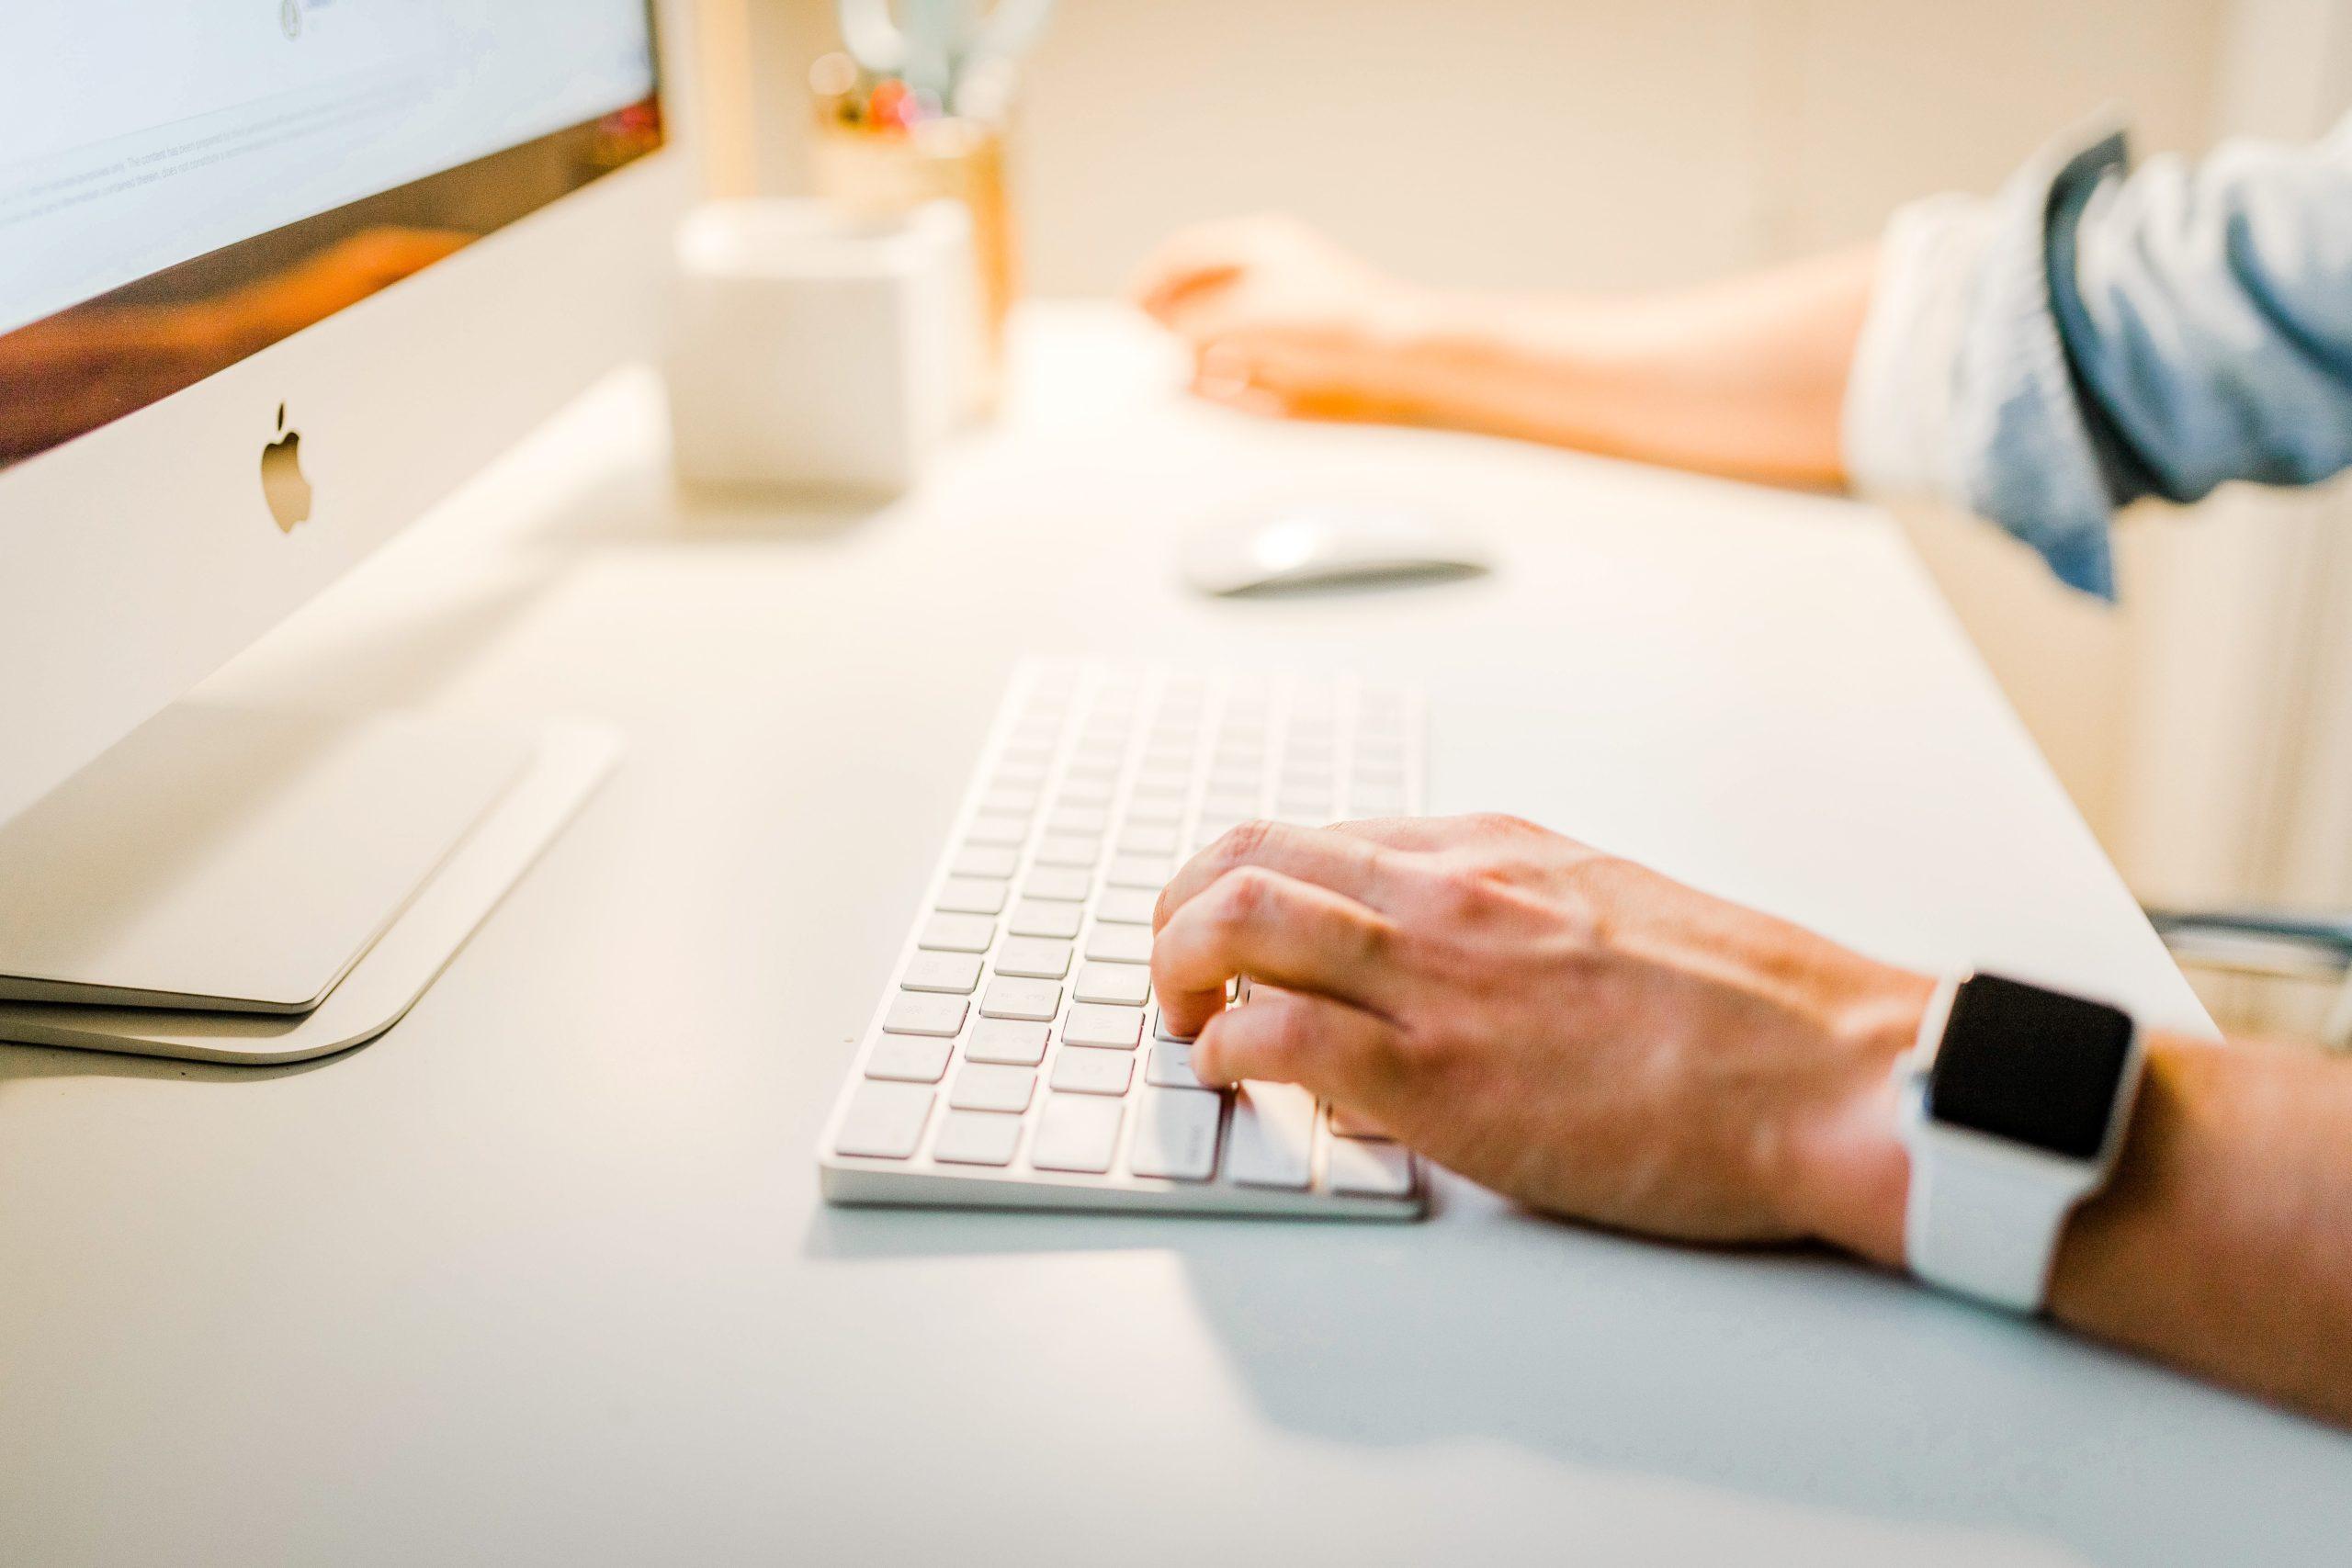 freelance-online-business-relationship